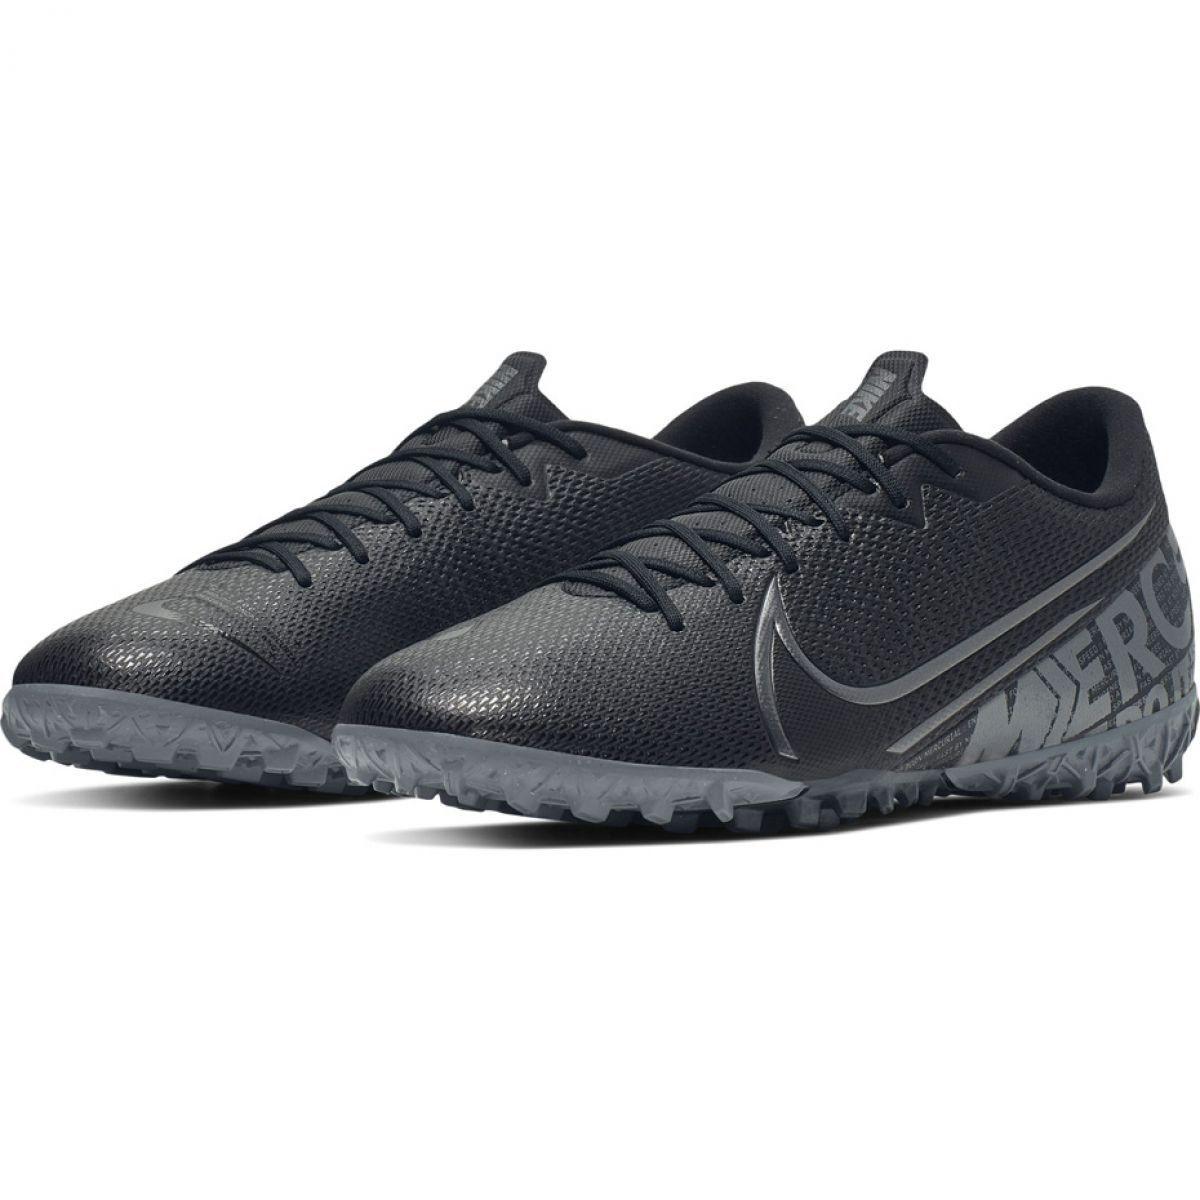 Buty Pilkarskie Nike Mercurial Vapor 13 Academy Tf M At7996 001 Czarne Soccer Shoe Football Shoes Black Shoes